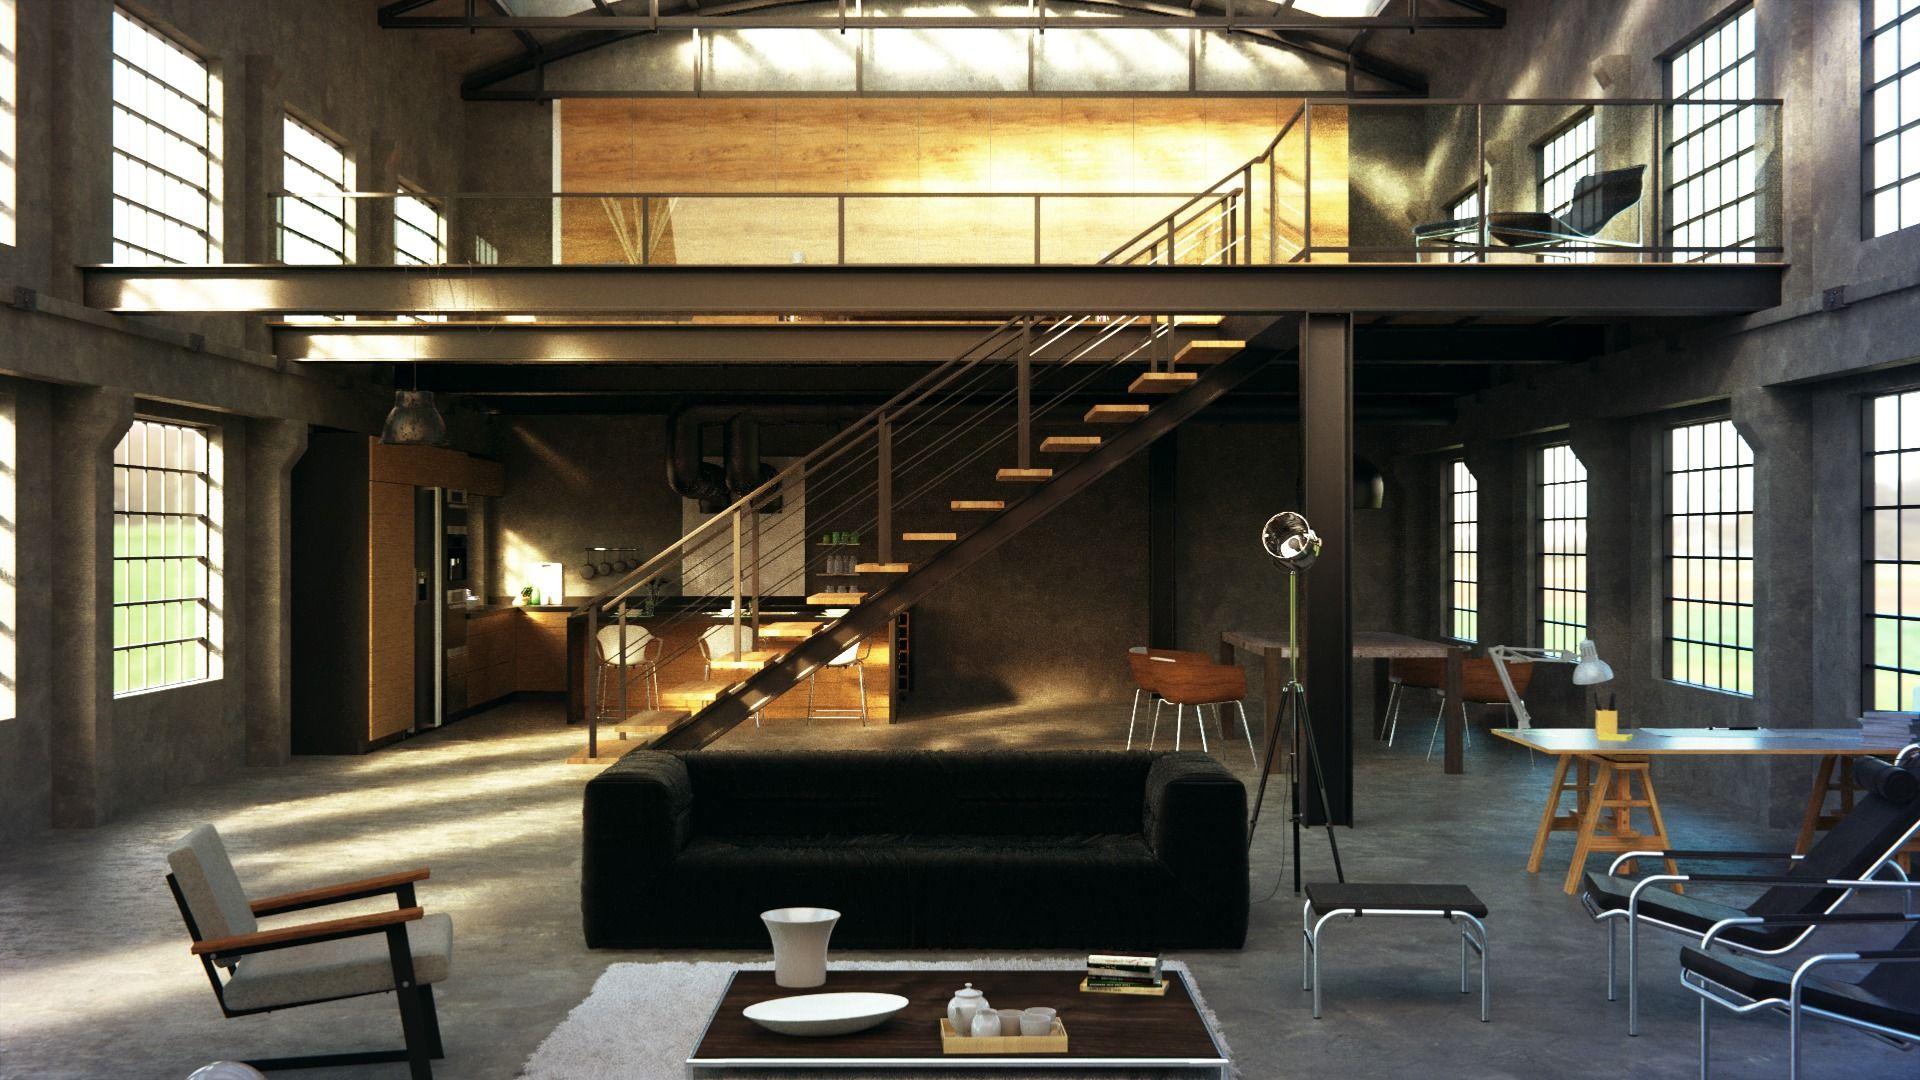 Industrial loft Industrial loft, Industrial style